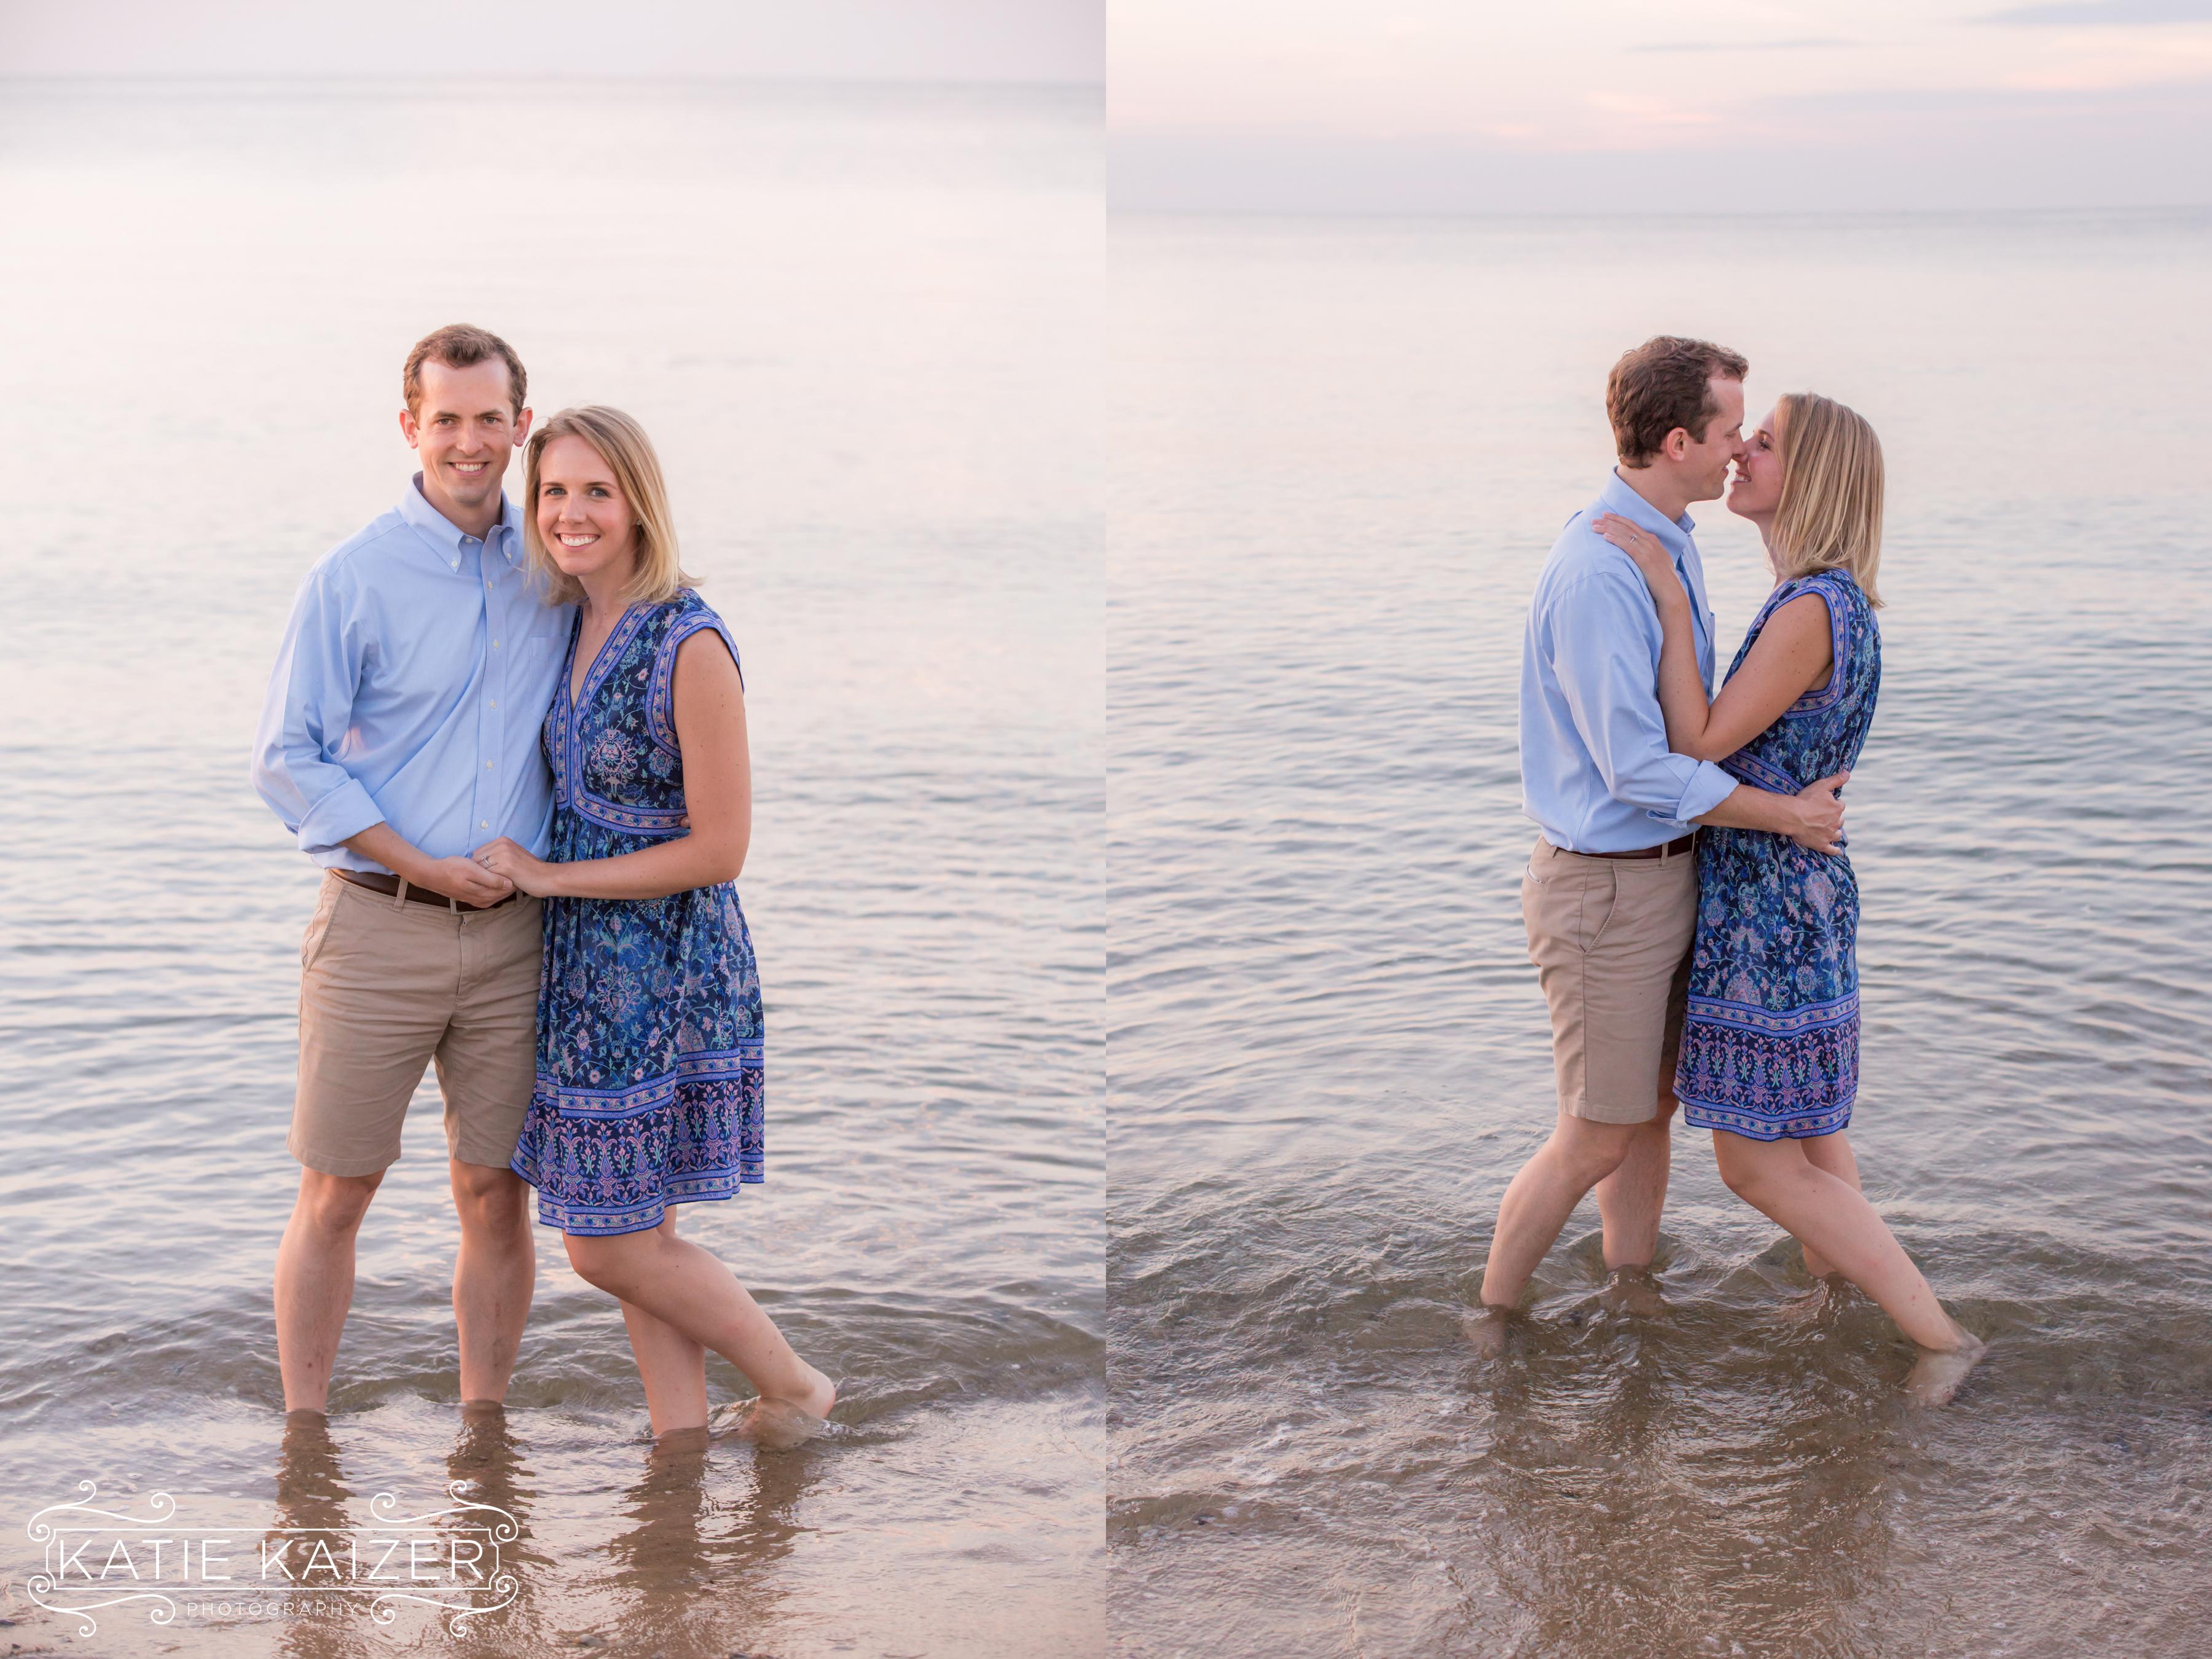 Kate&Dan_020_KatieKaizerPhotography